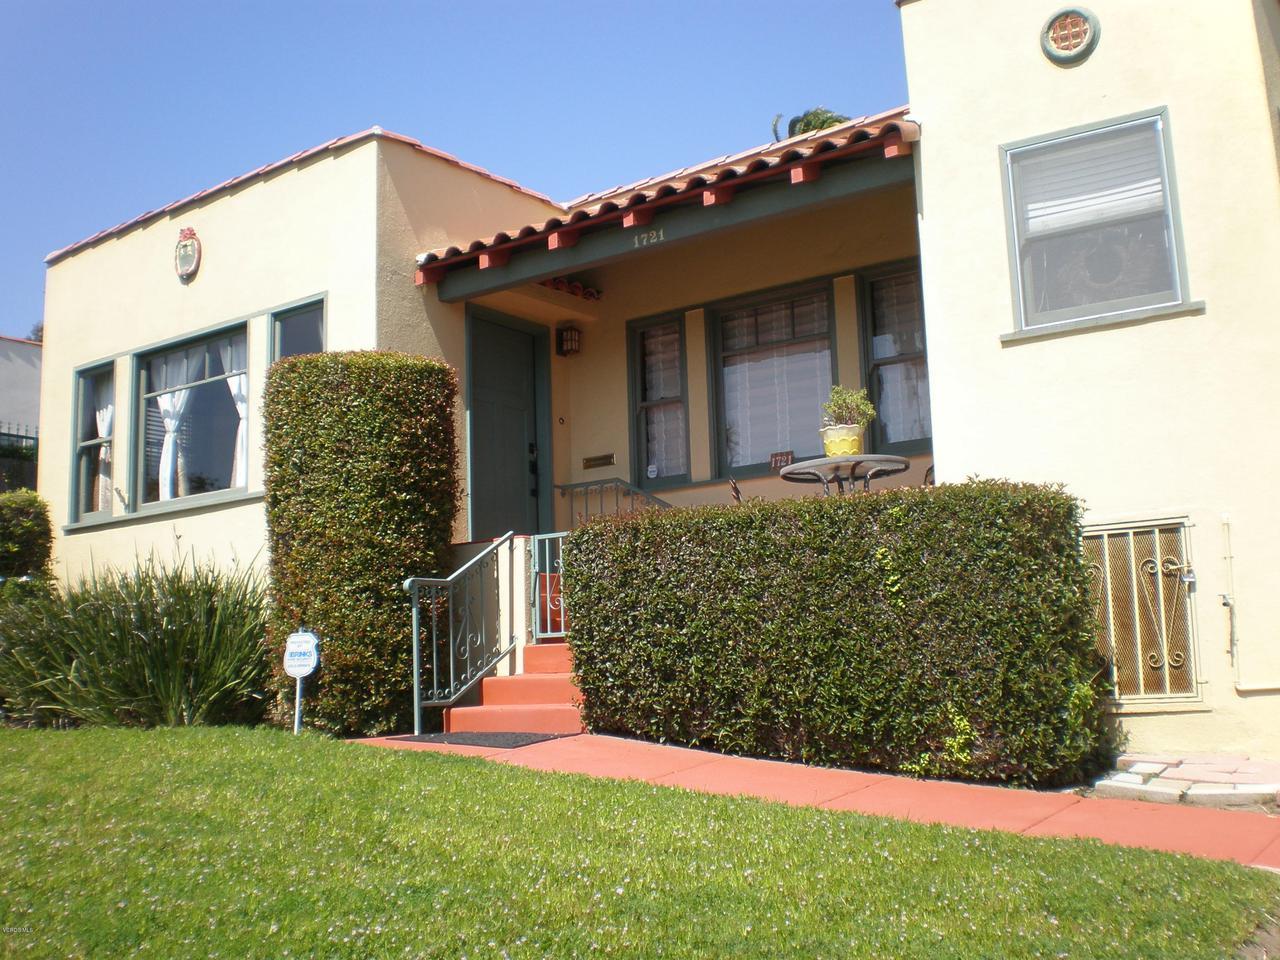 1721 POLI, Ventura, CA 93001 - P1010004